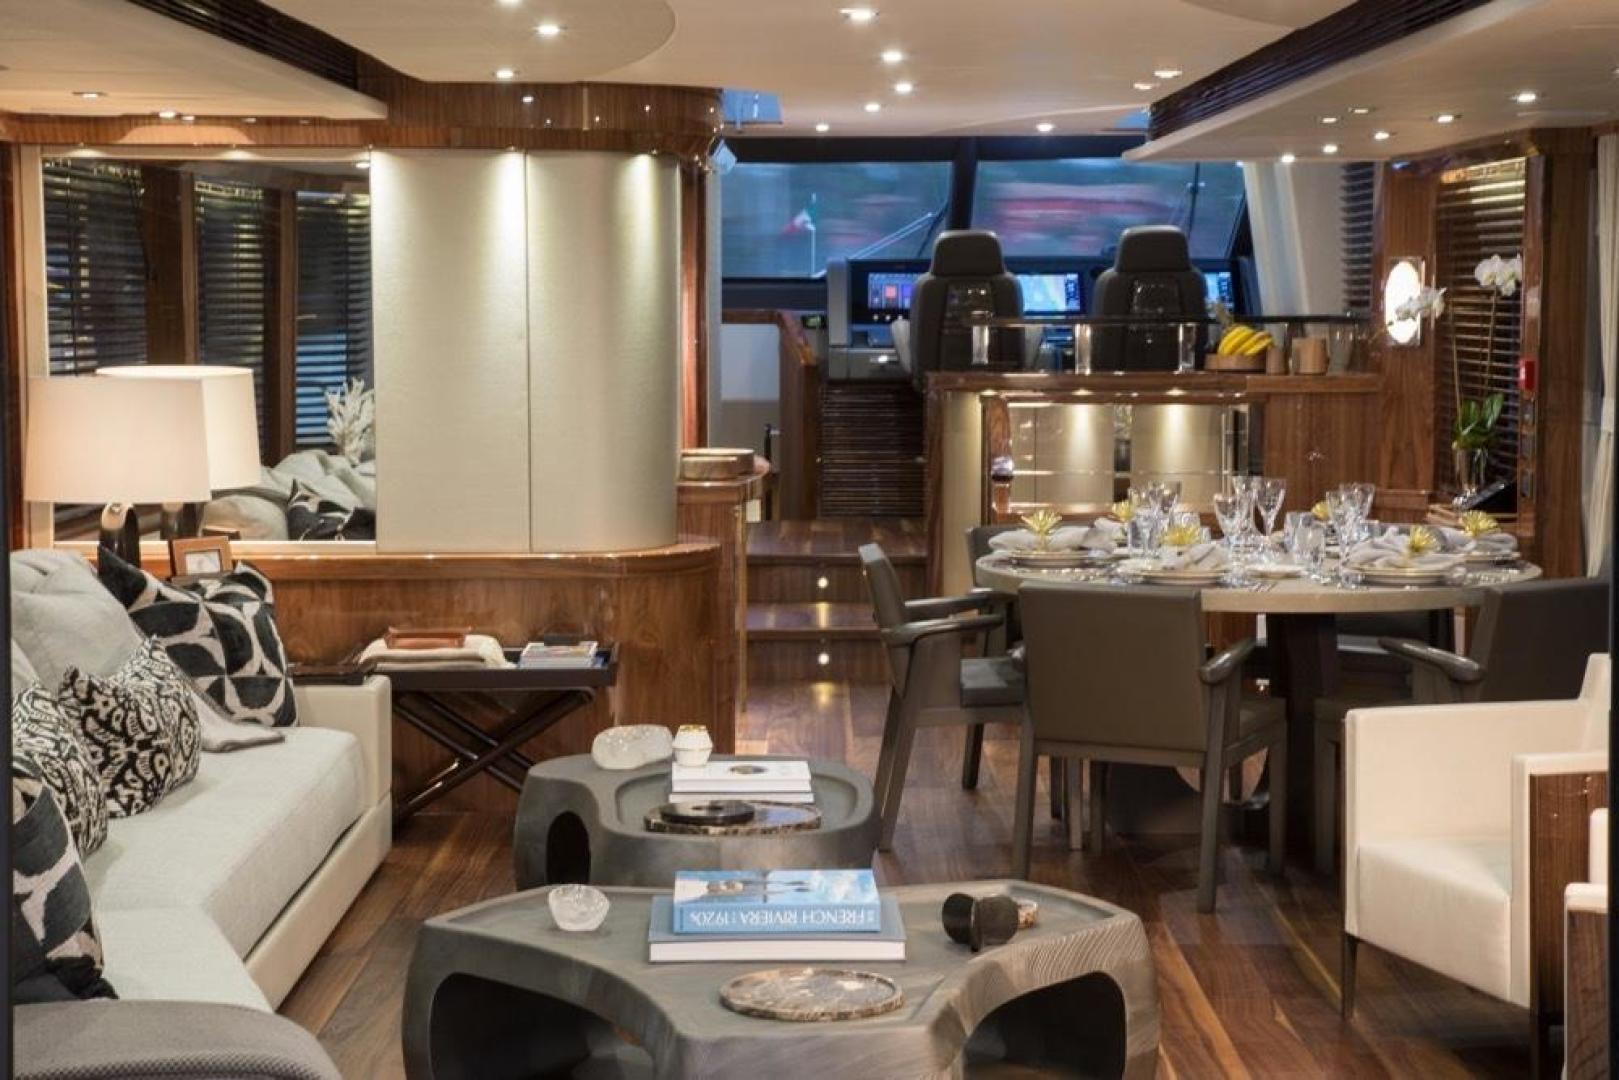 Sunseeker-28 Metre Yacht 2016-RIII Miami-Florida-United States-2016 SUNSEEKER 92 RIII FOR SALE-600100 | Thumbnail